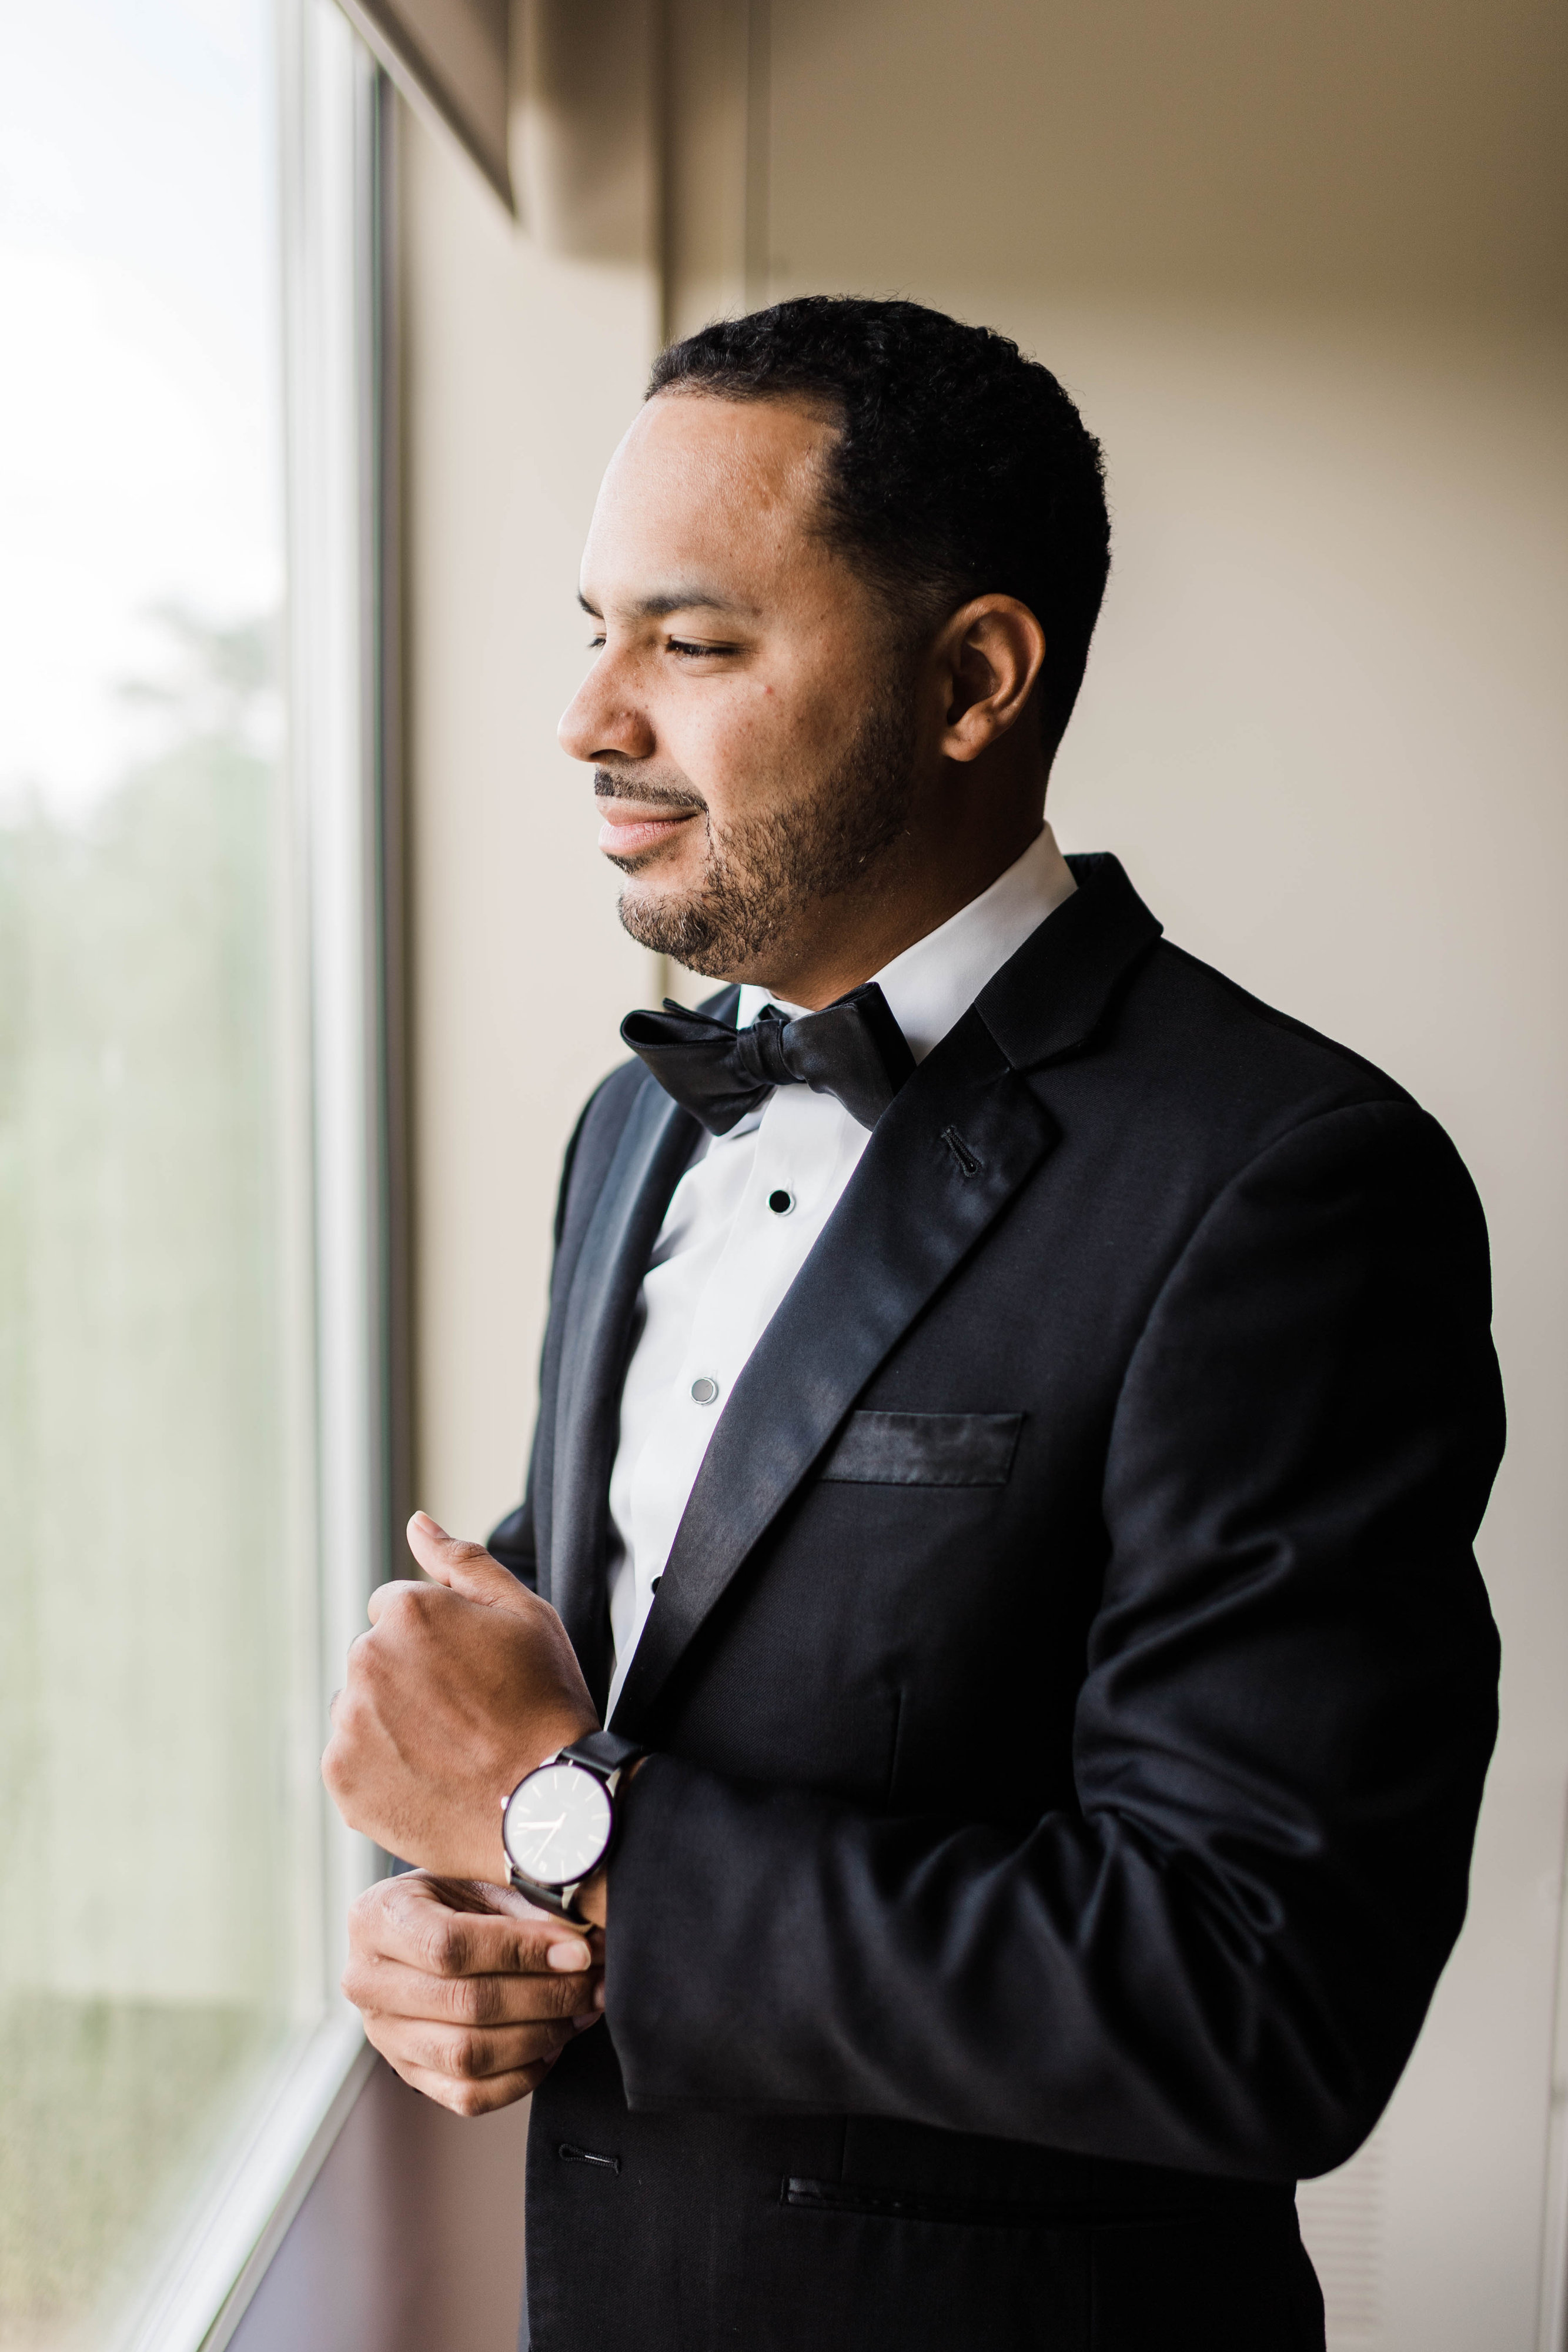 groom wearing traditional black tuxedo wedding look